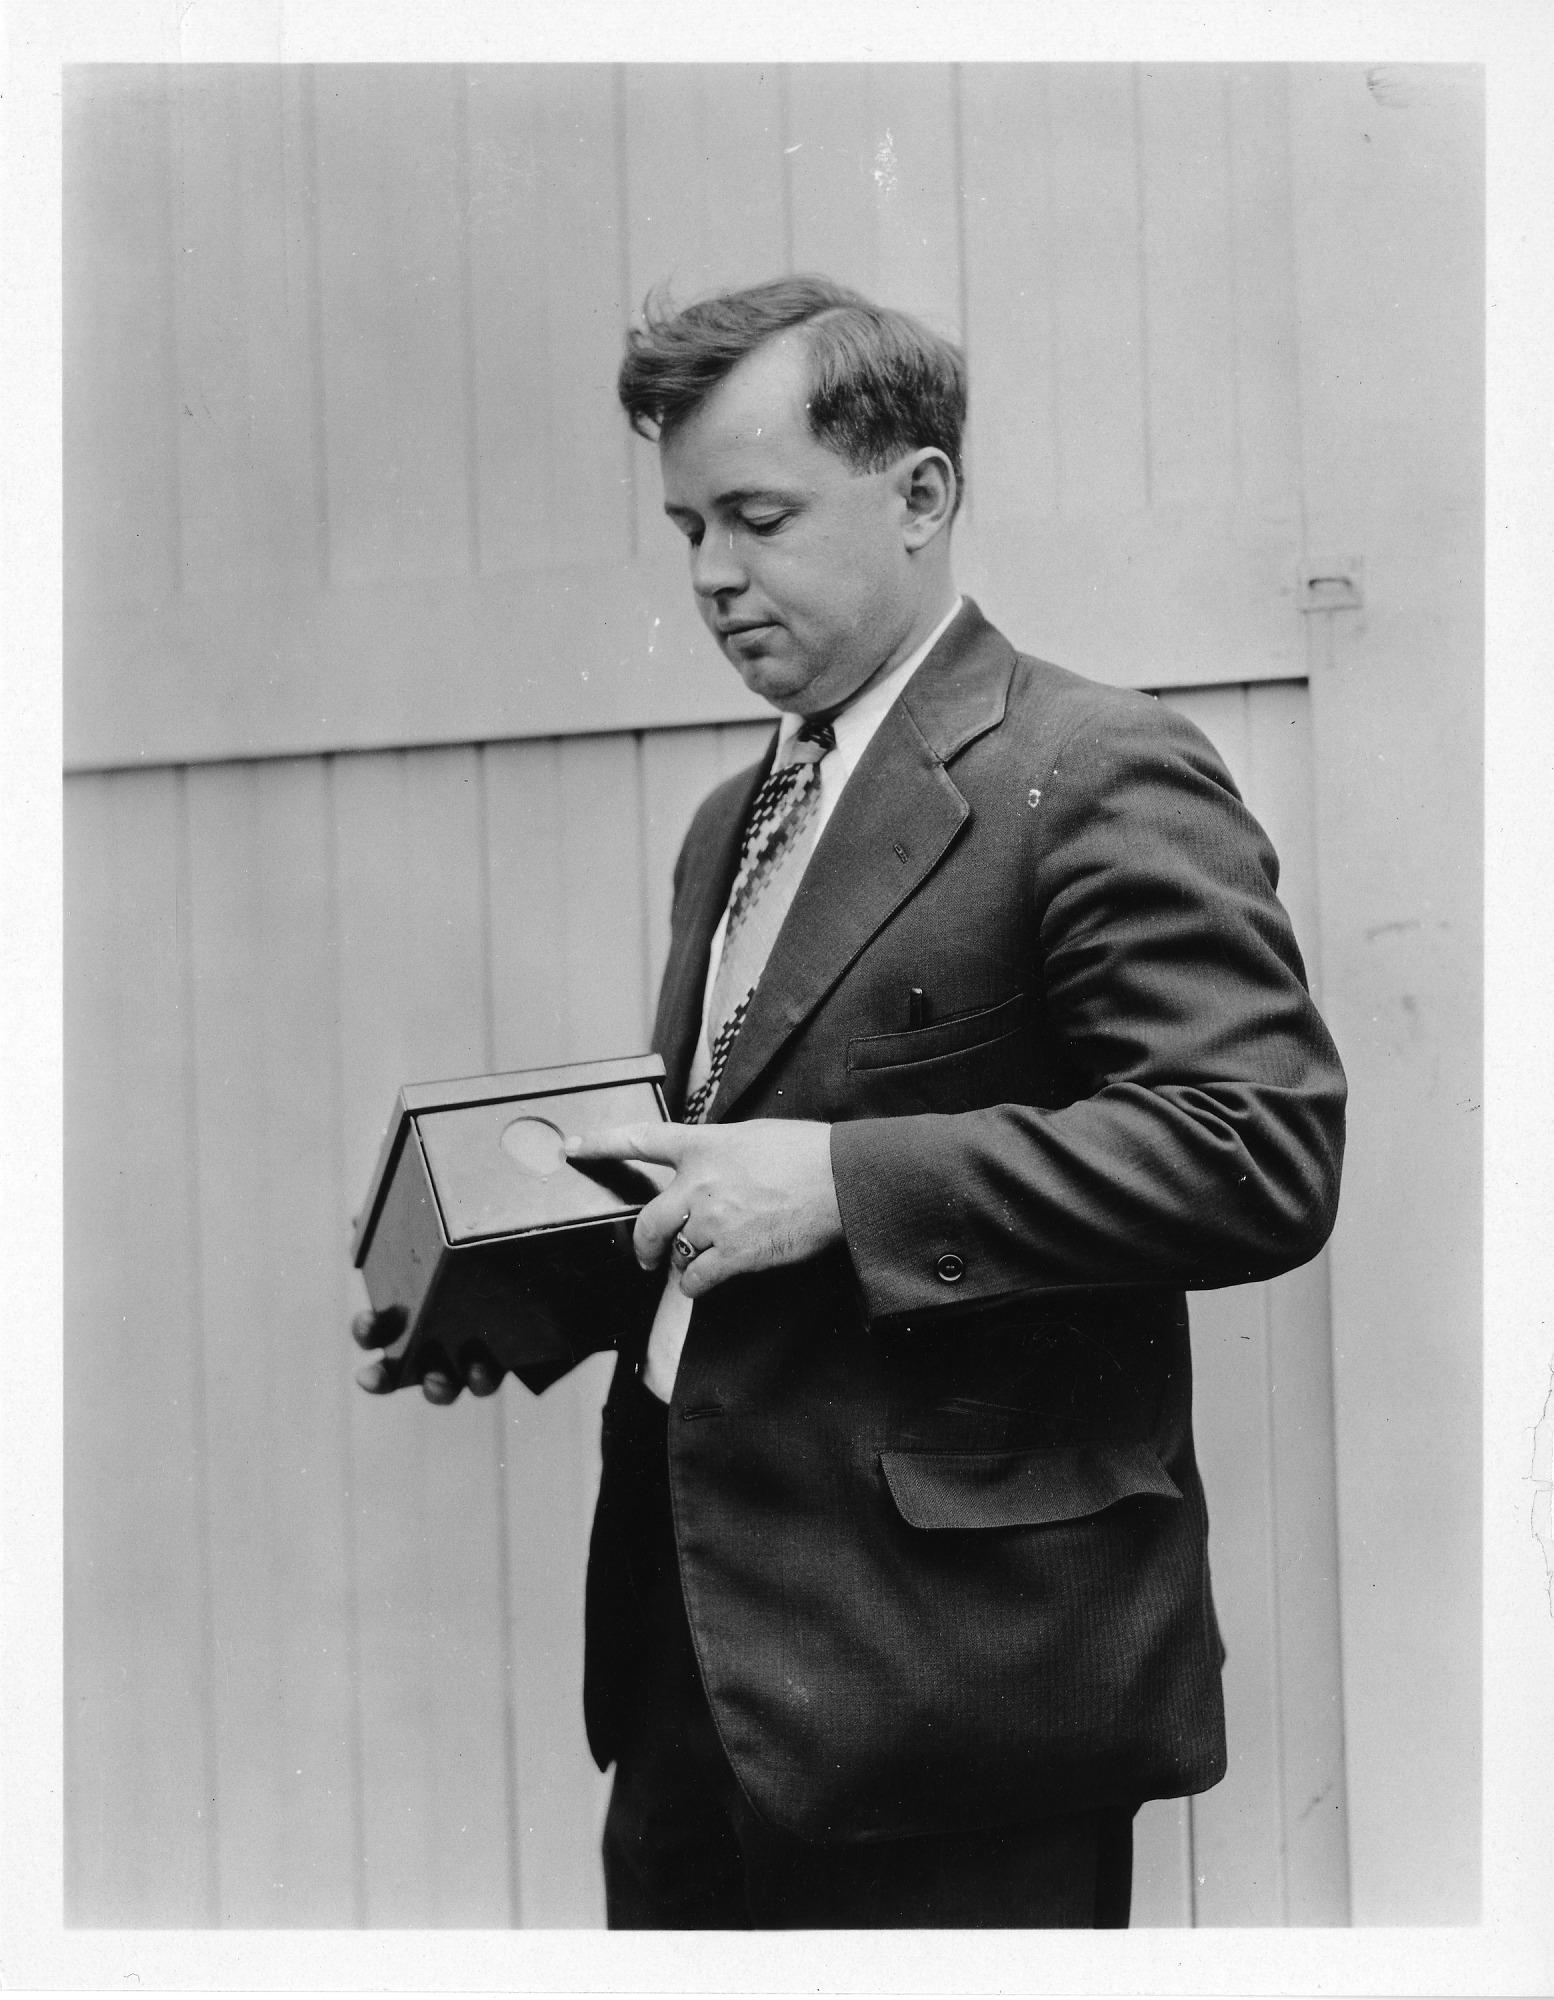 Robert C. Burt (b. 1896), Smithsonian Institution Archives, SIA Acc. 90-105 [SIA2008-0088].